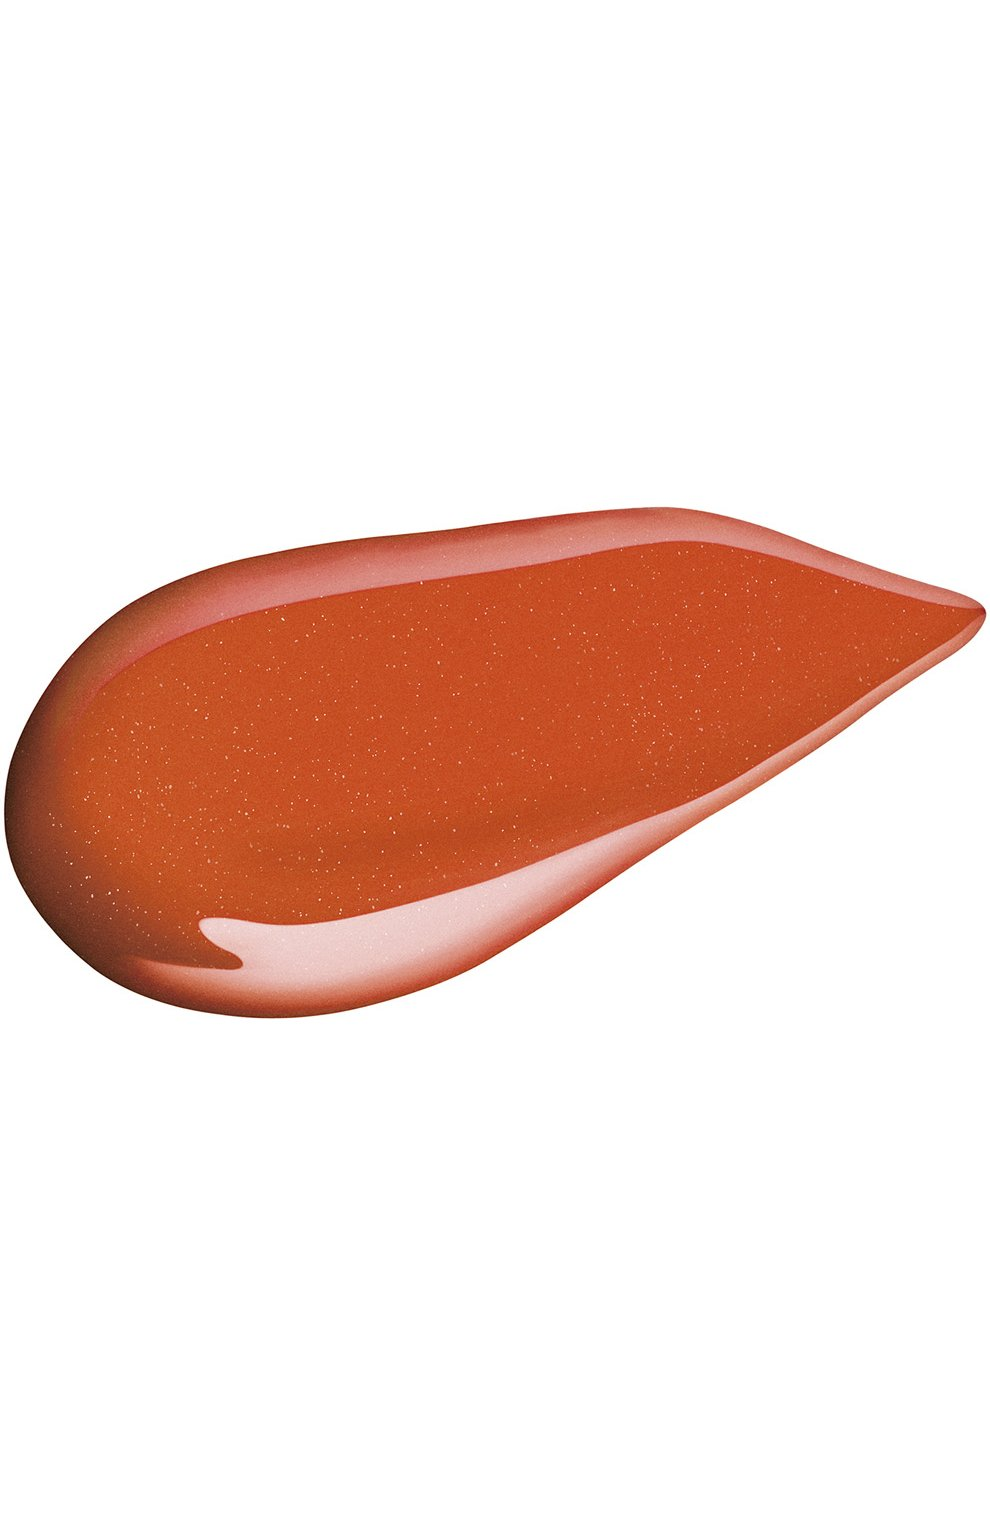 Женская помада-блеск lacquer rouge or508 SHISEIDO бесцветного цвета, арт. 10897SH   Фото 2